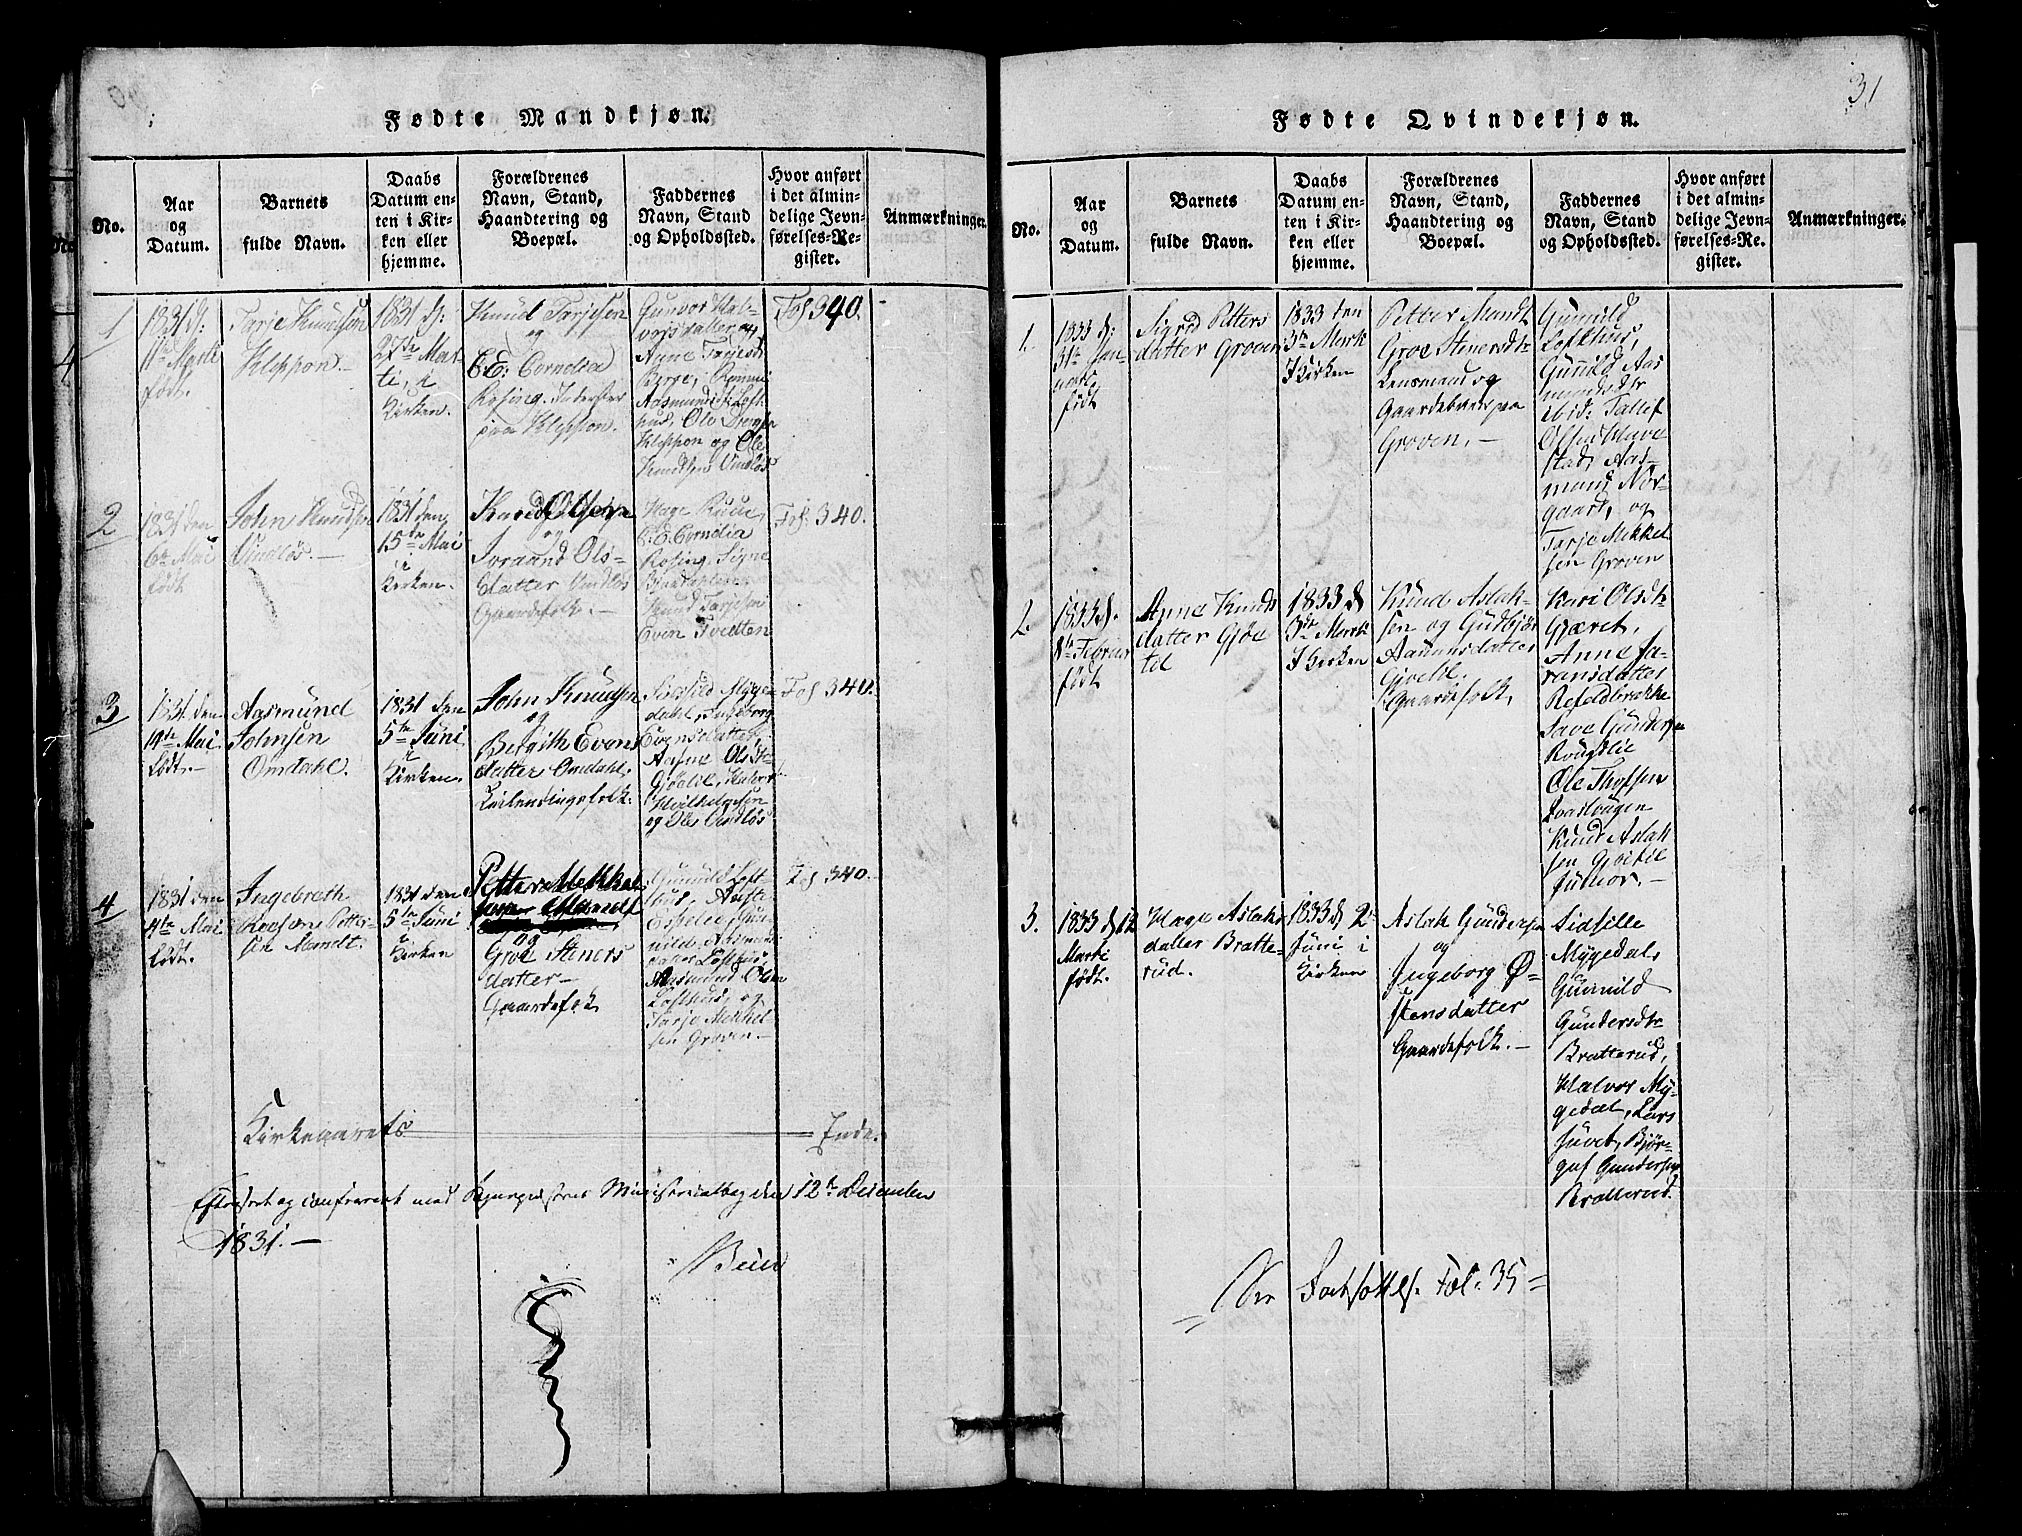 SAKO, Lårdal kirkebøker, G/Gb/L0001: Klokkerbok nr. II 1, 1815-1865, s. 31